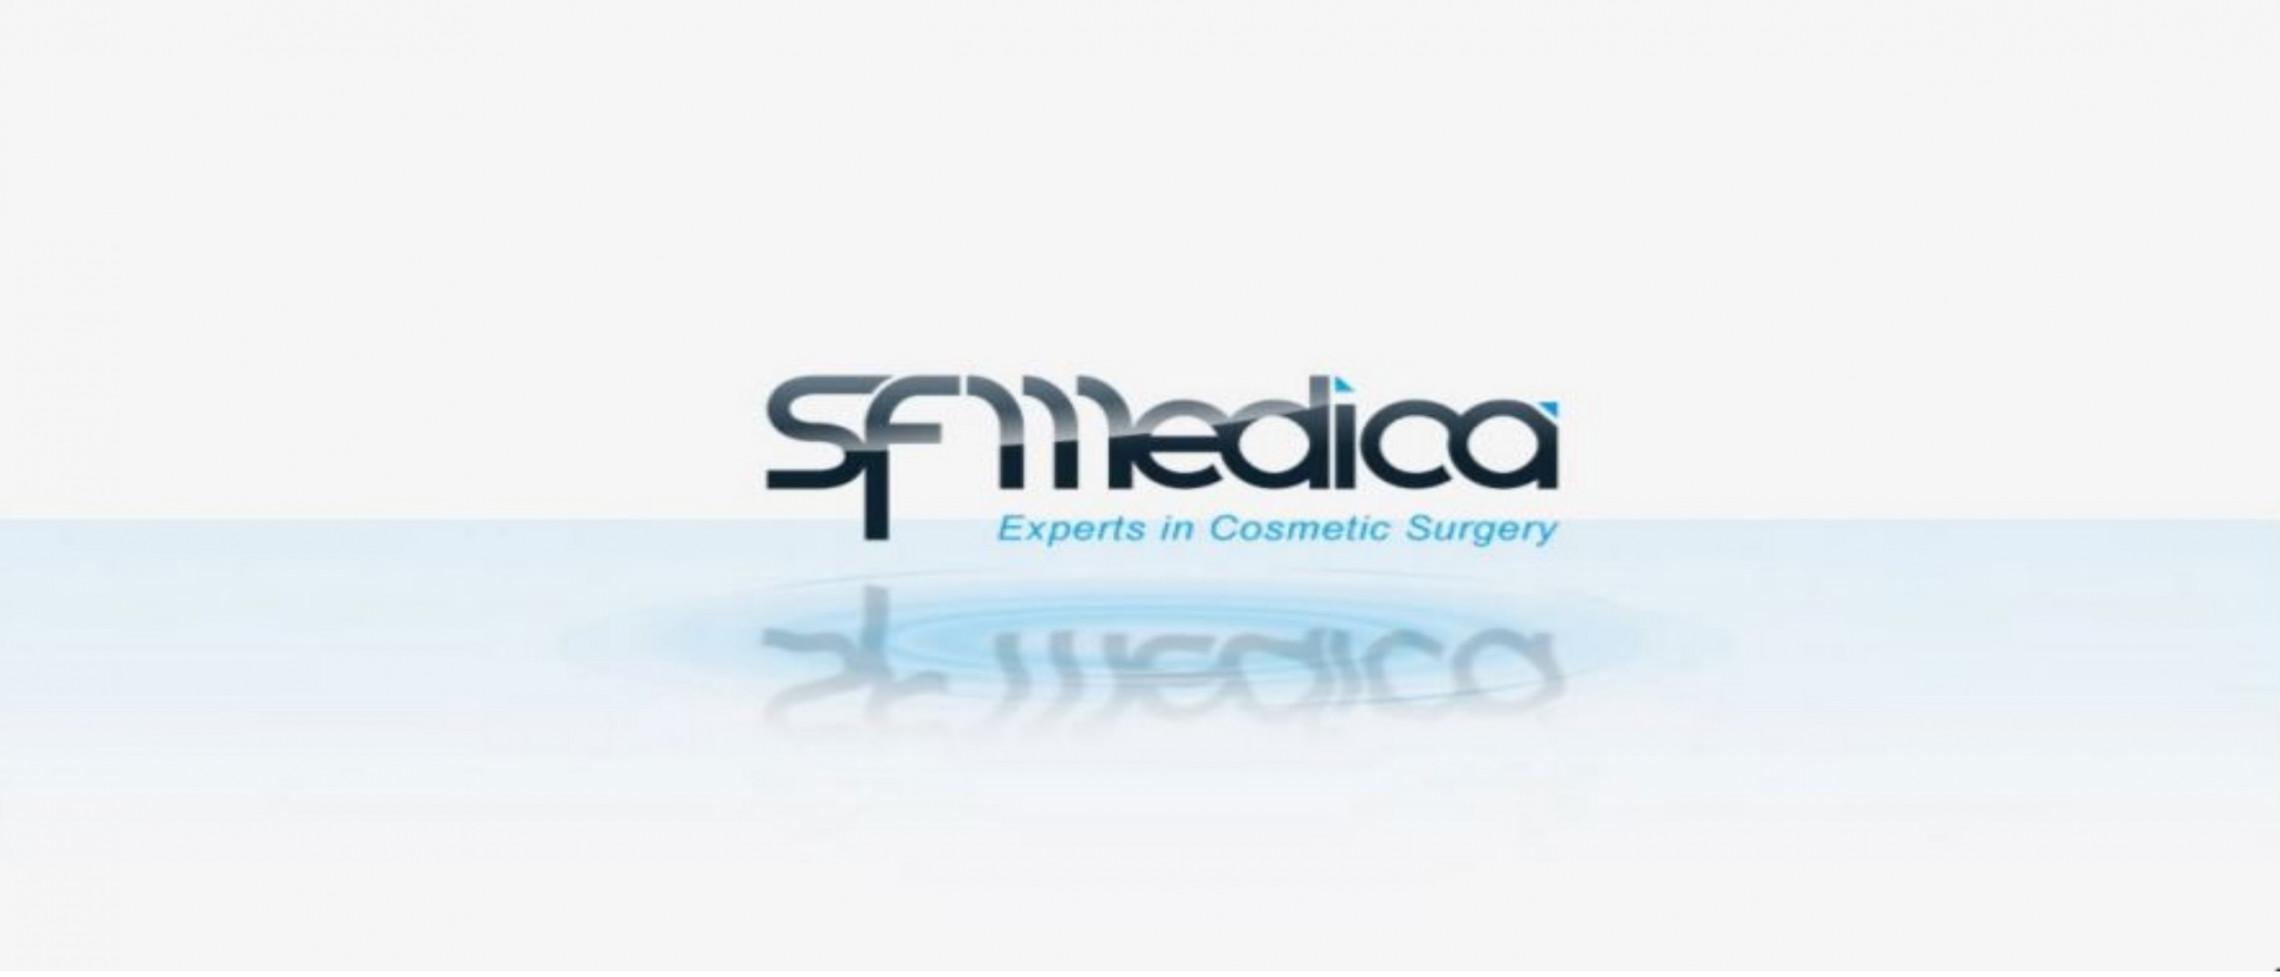 SFMedica